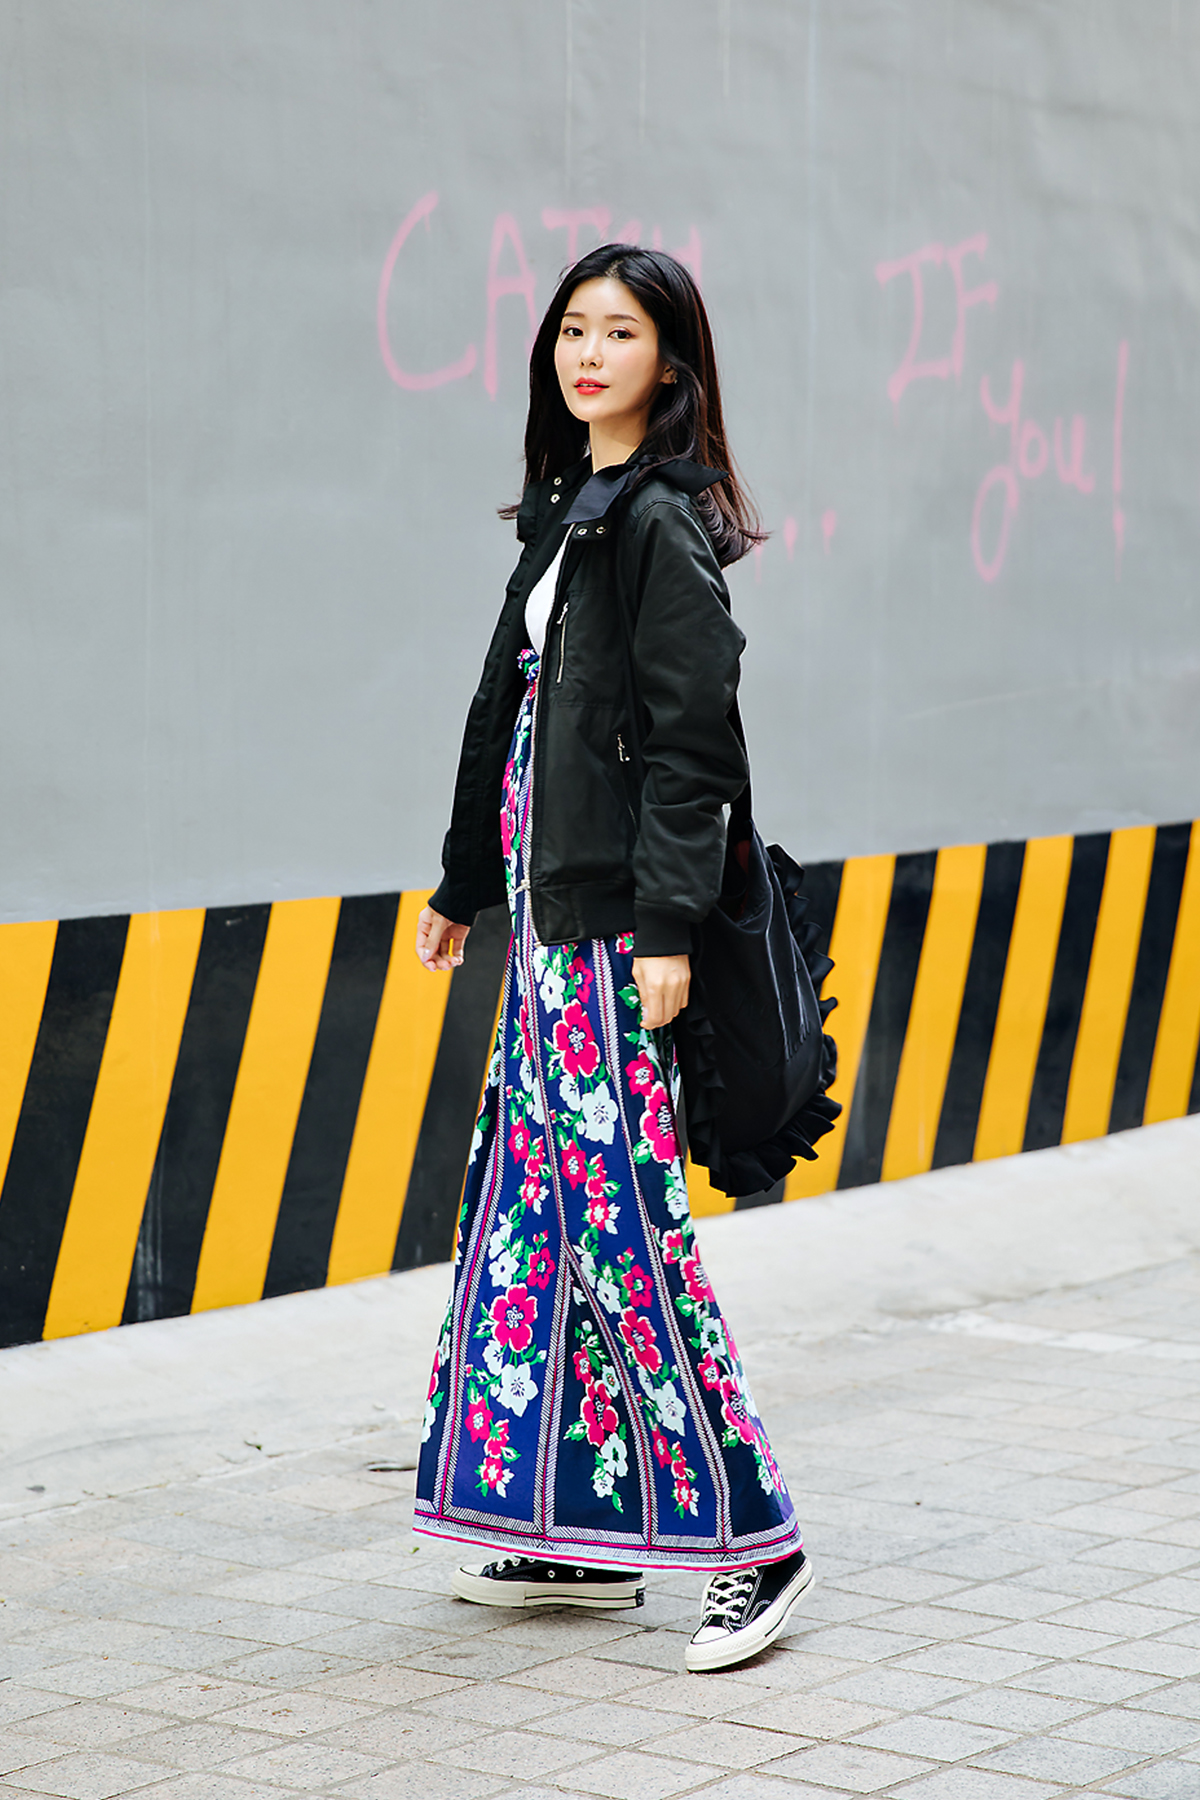 Lee Sanga, Street style women spring 2018 in seoul